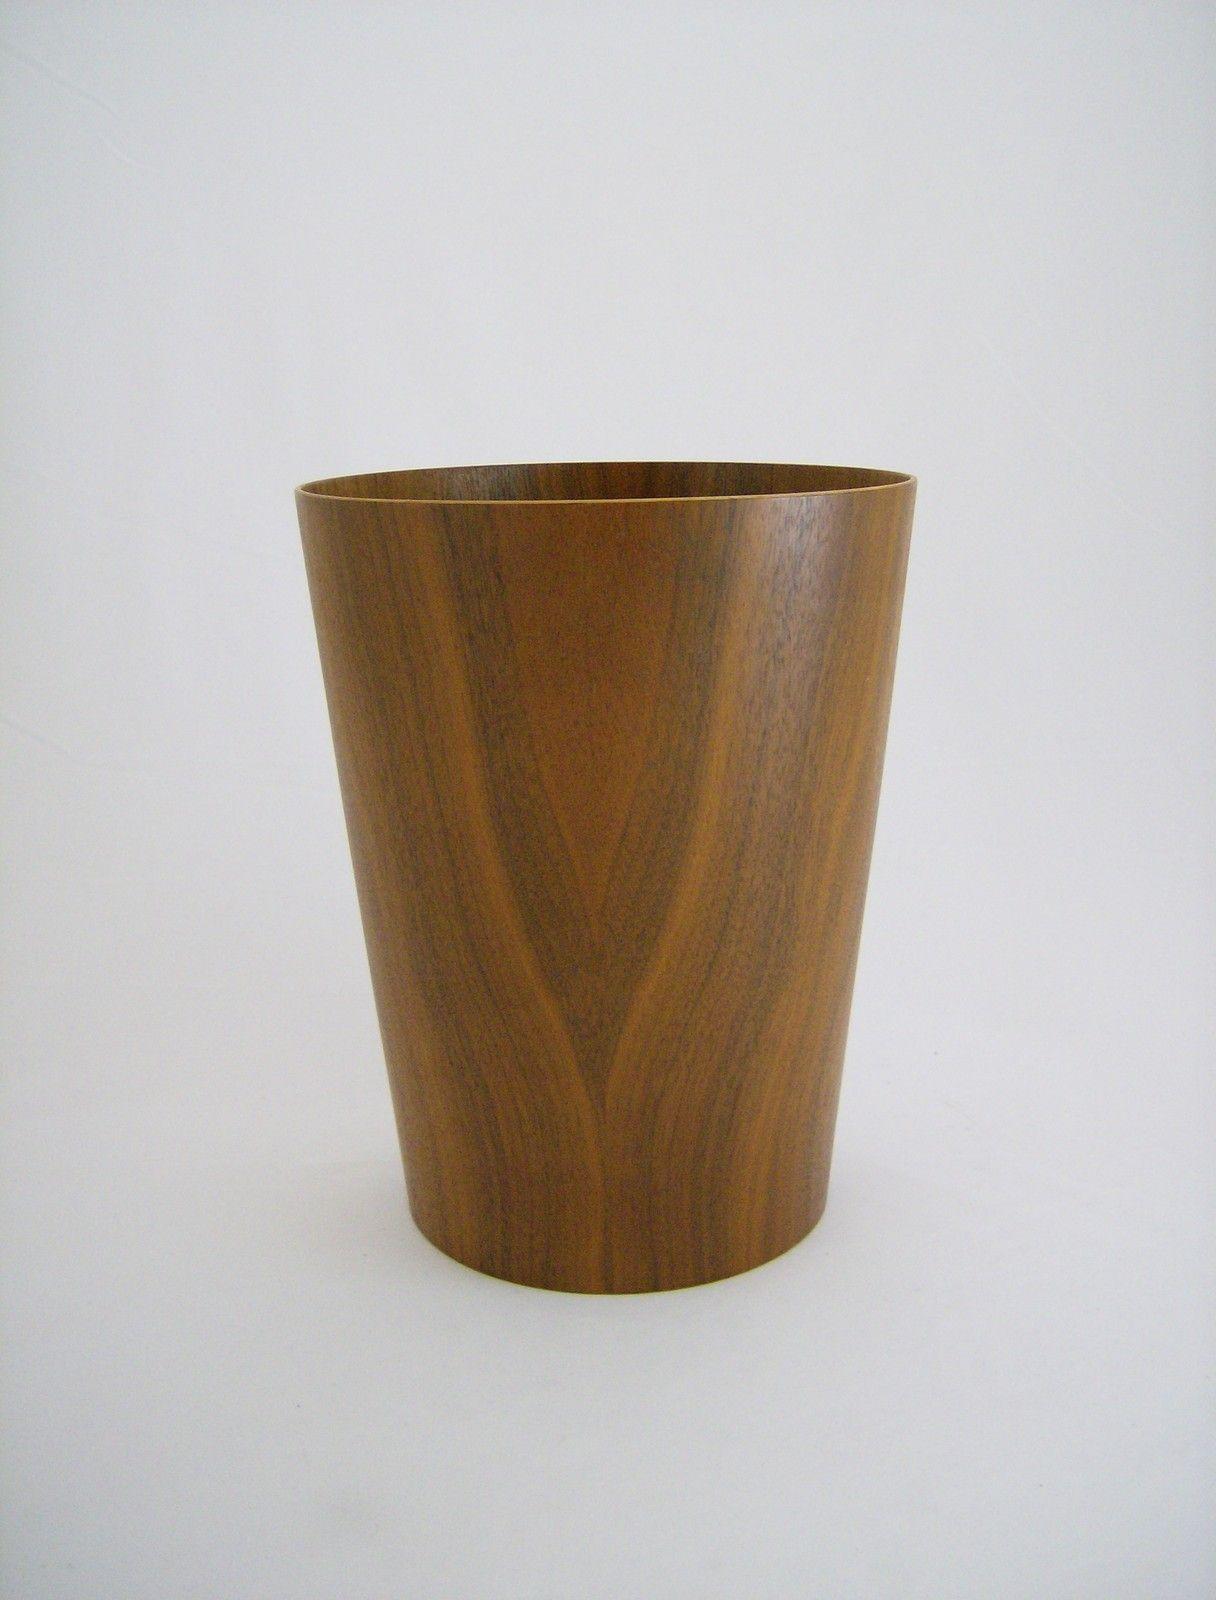 Walnut Waste Paper Basket Trash Can Made in Sweden Vtg Mid Century Danish Modern